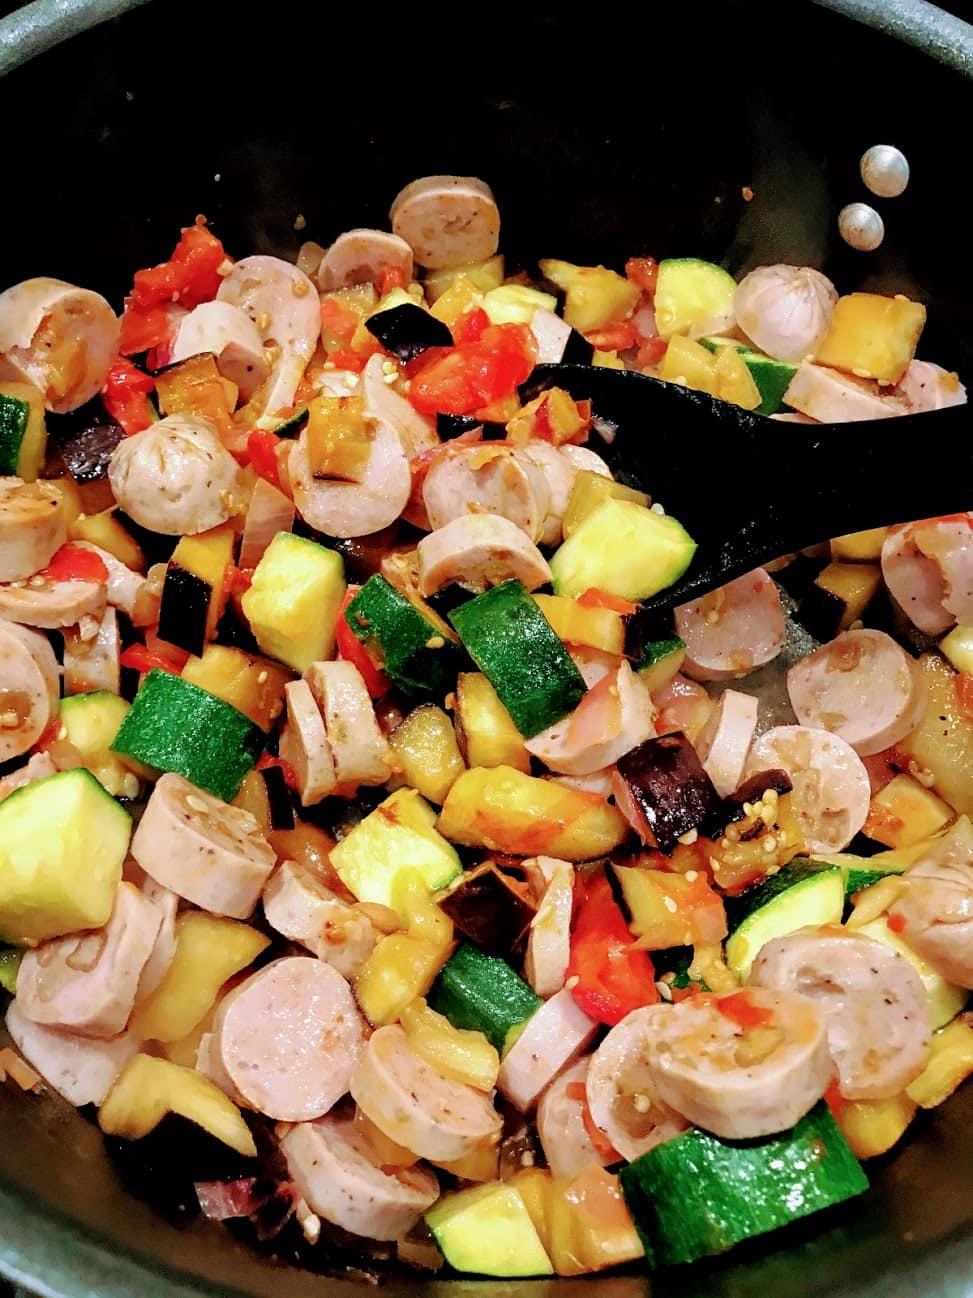 cooking apple sausage and veggies on pan